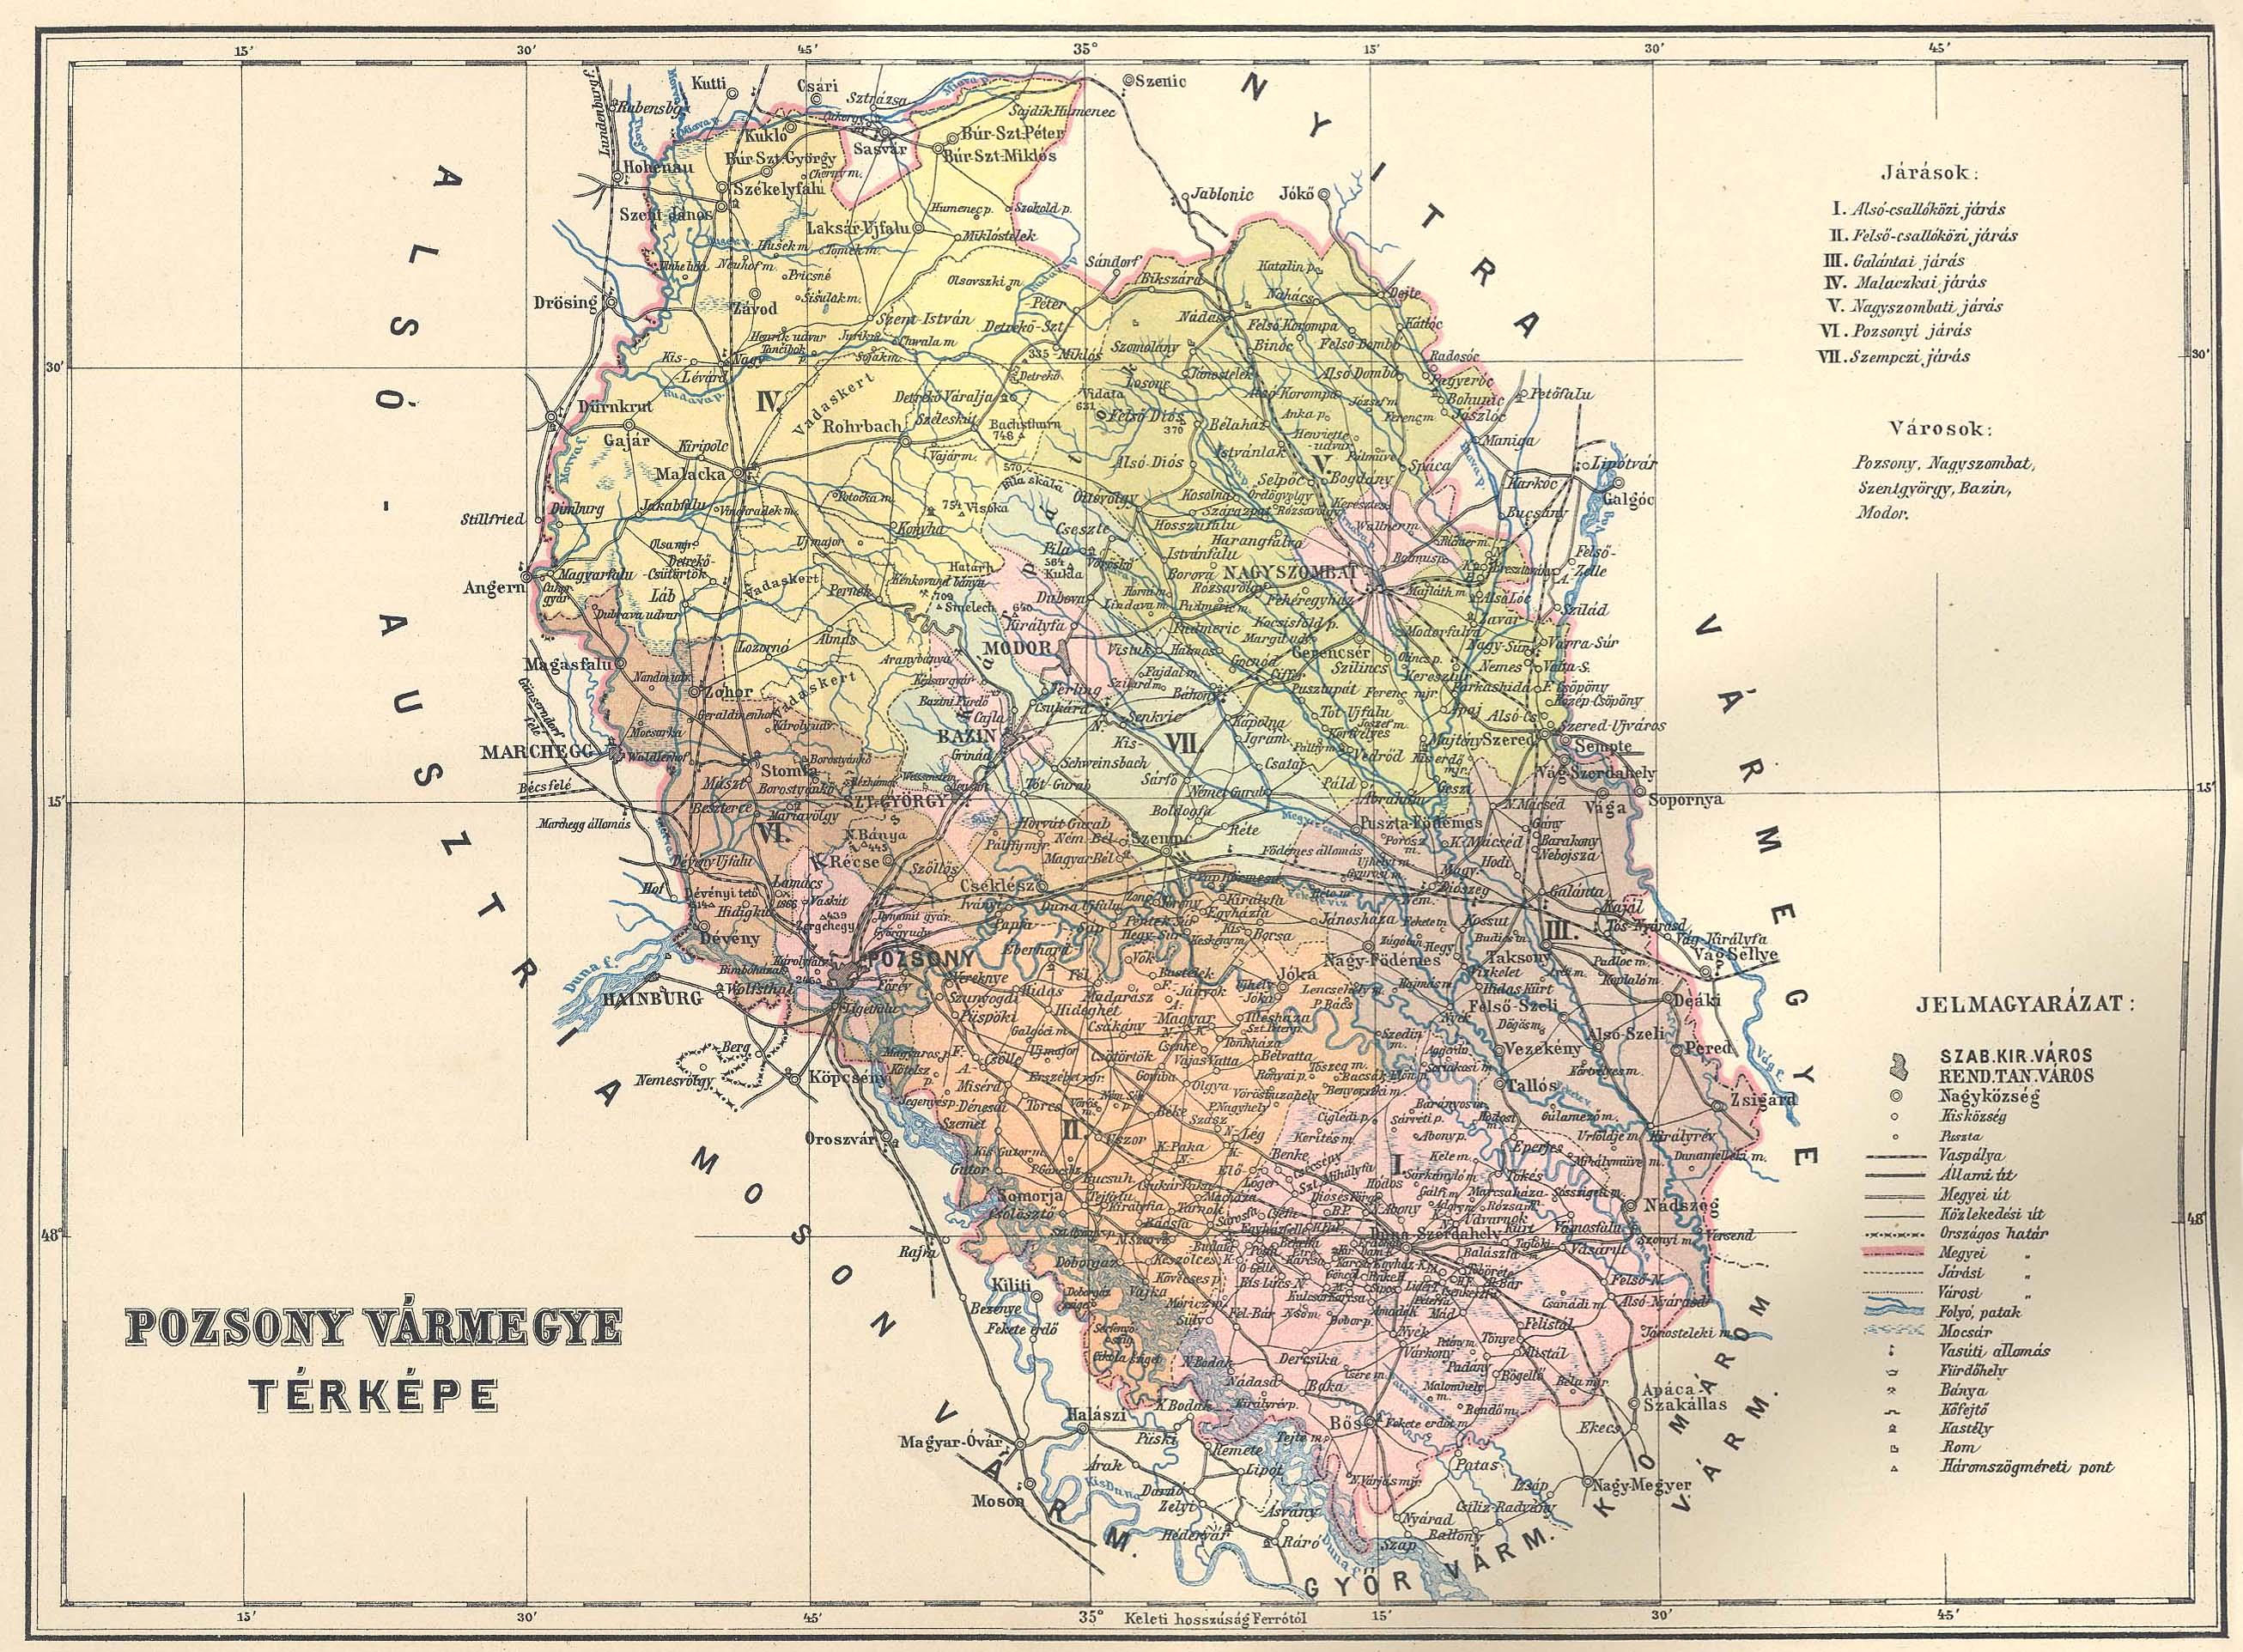 Pozsony Varmegye Terkepe Digitalis Keparchivum Dka 026615